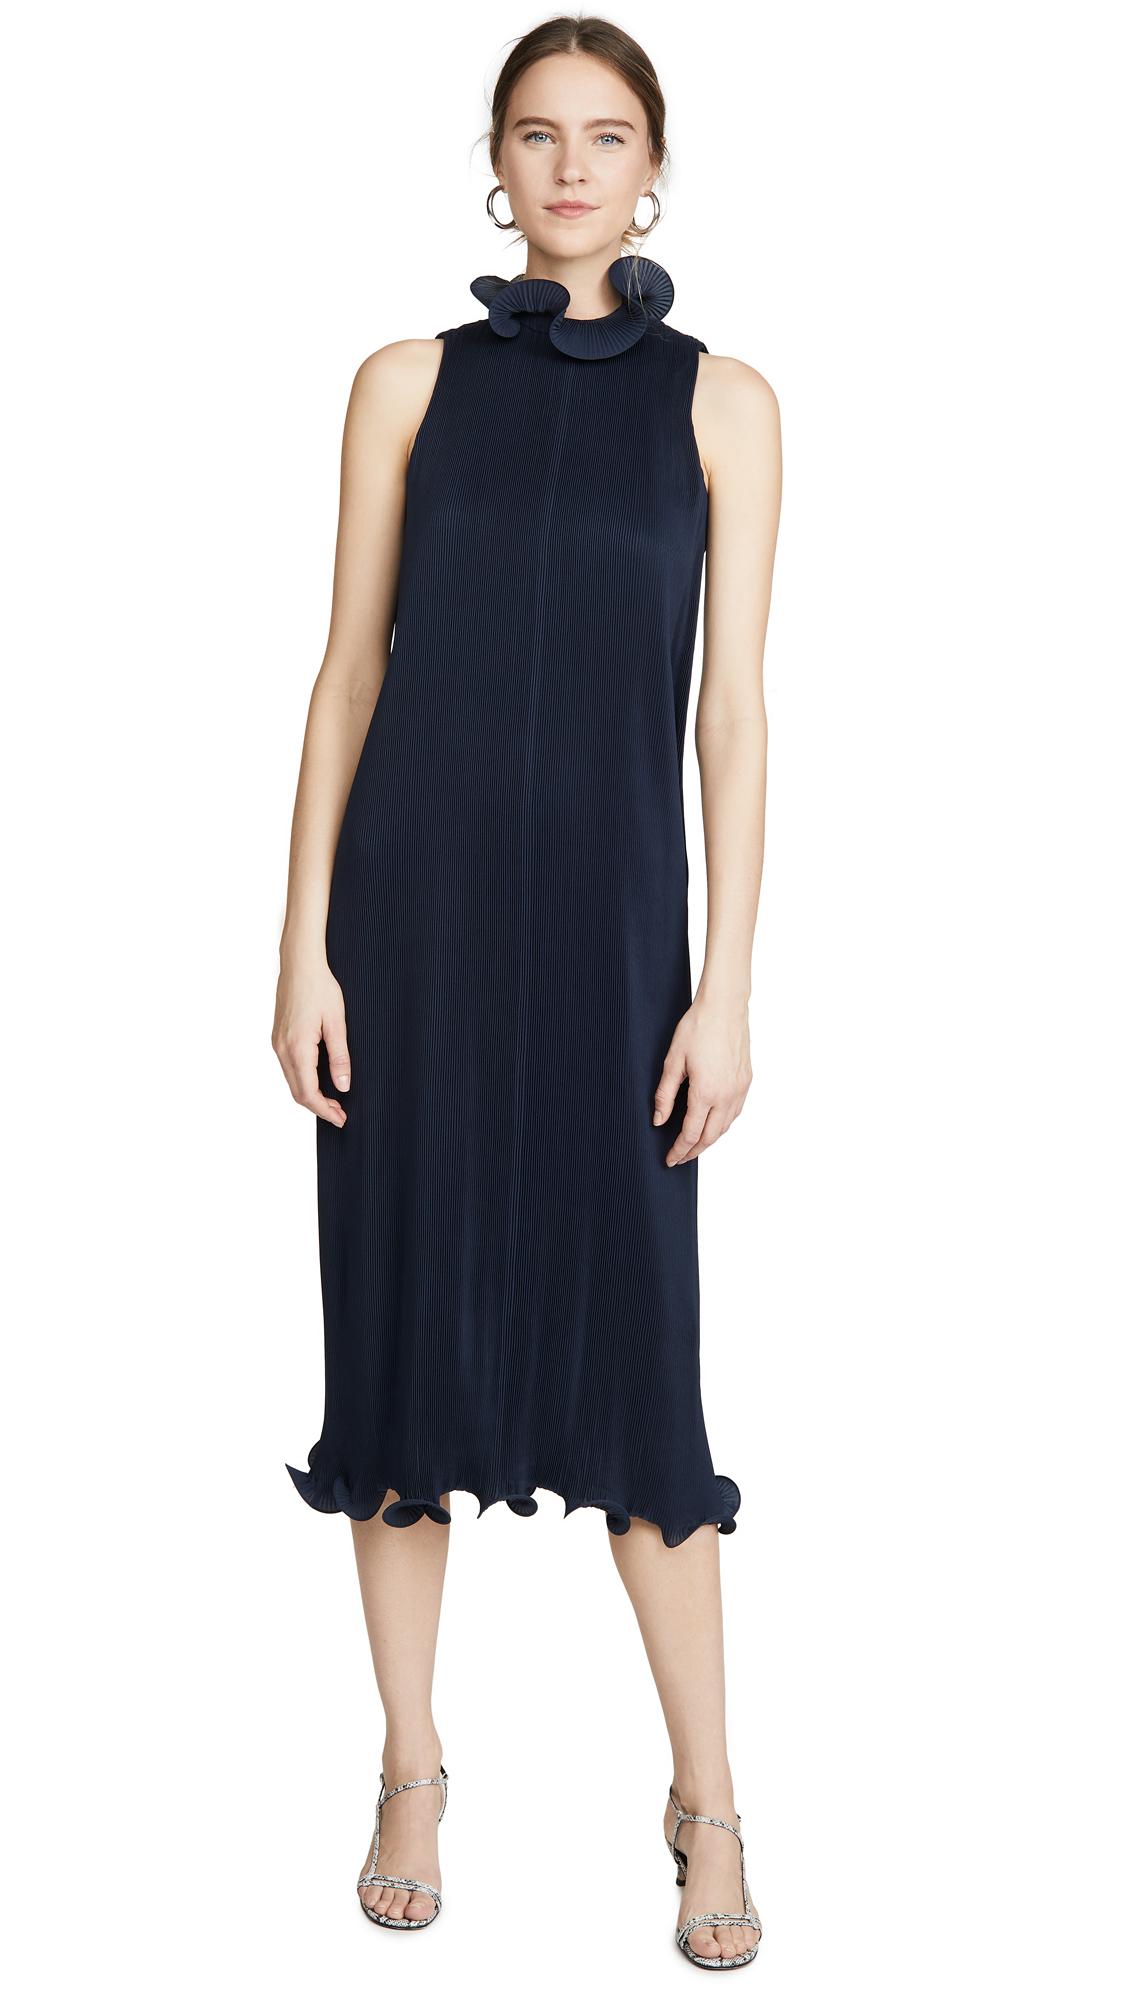 Tibi Sleeveless Pleated Dress – 50% Off Sale